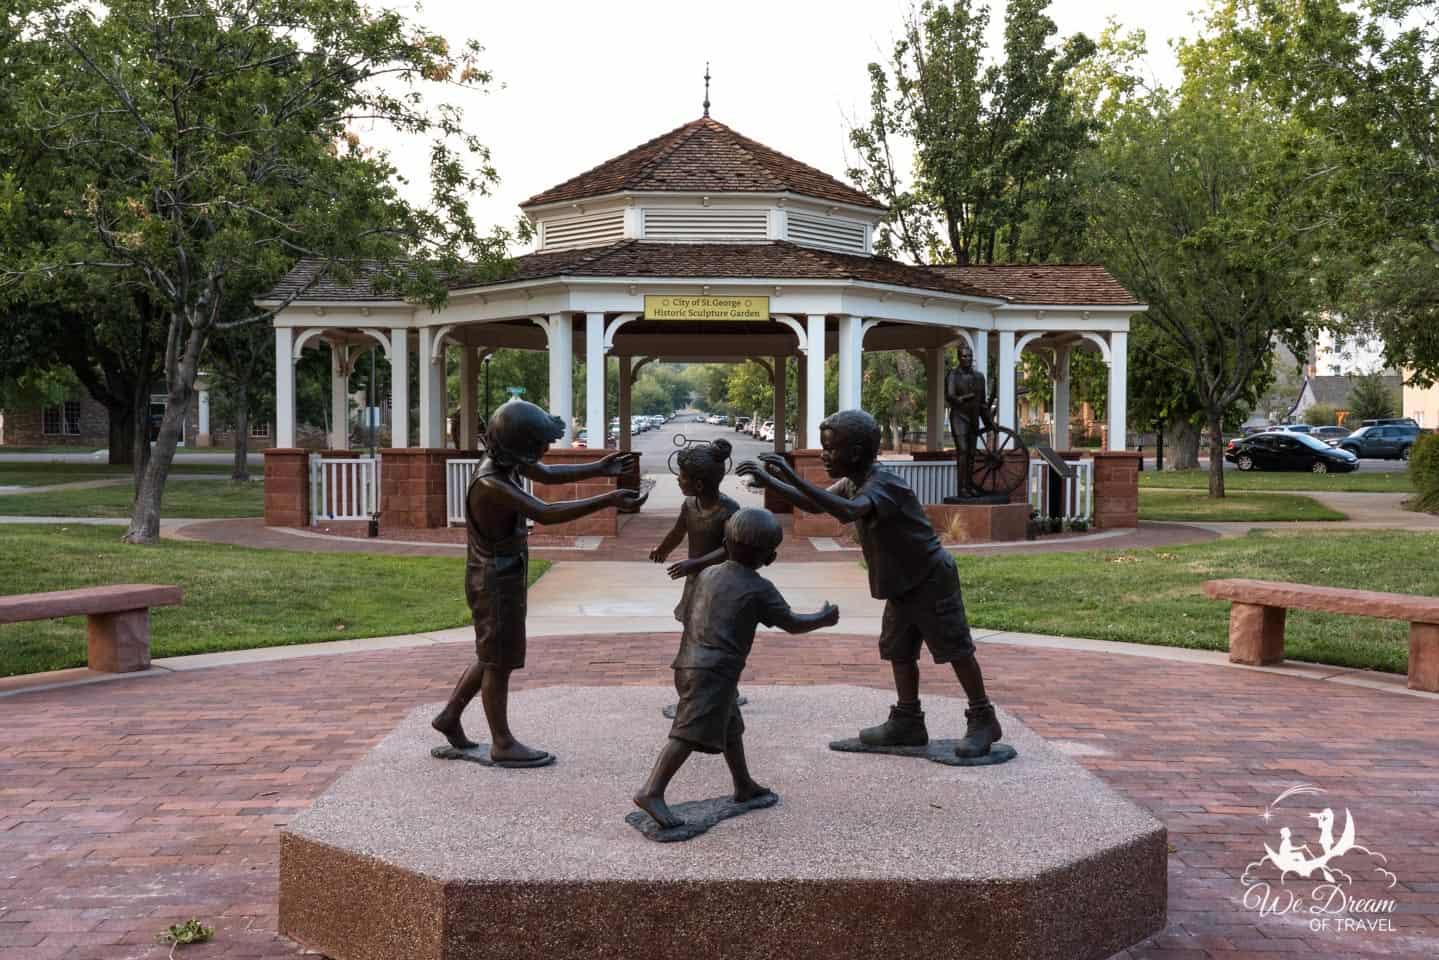 Historic Sculpture Garden in St George, Utah